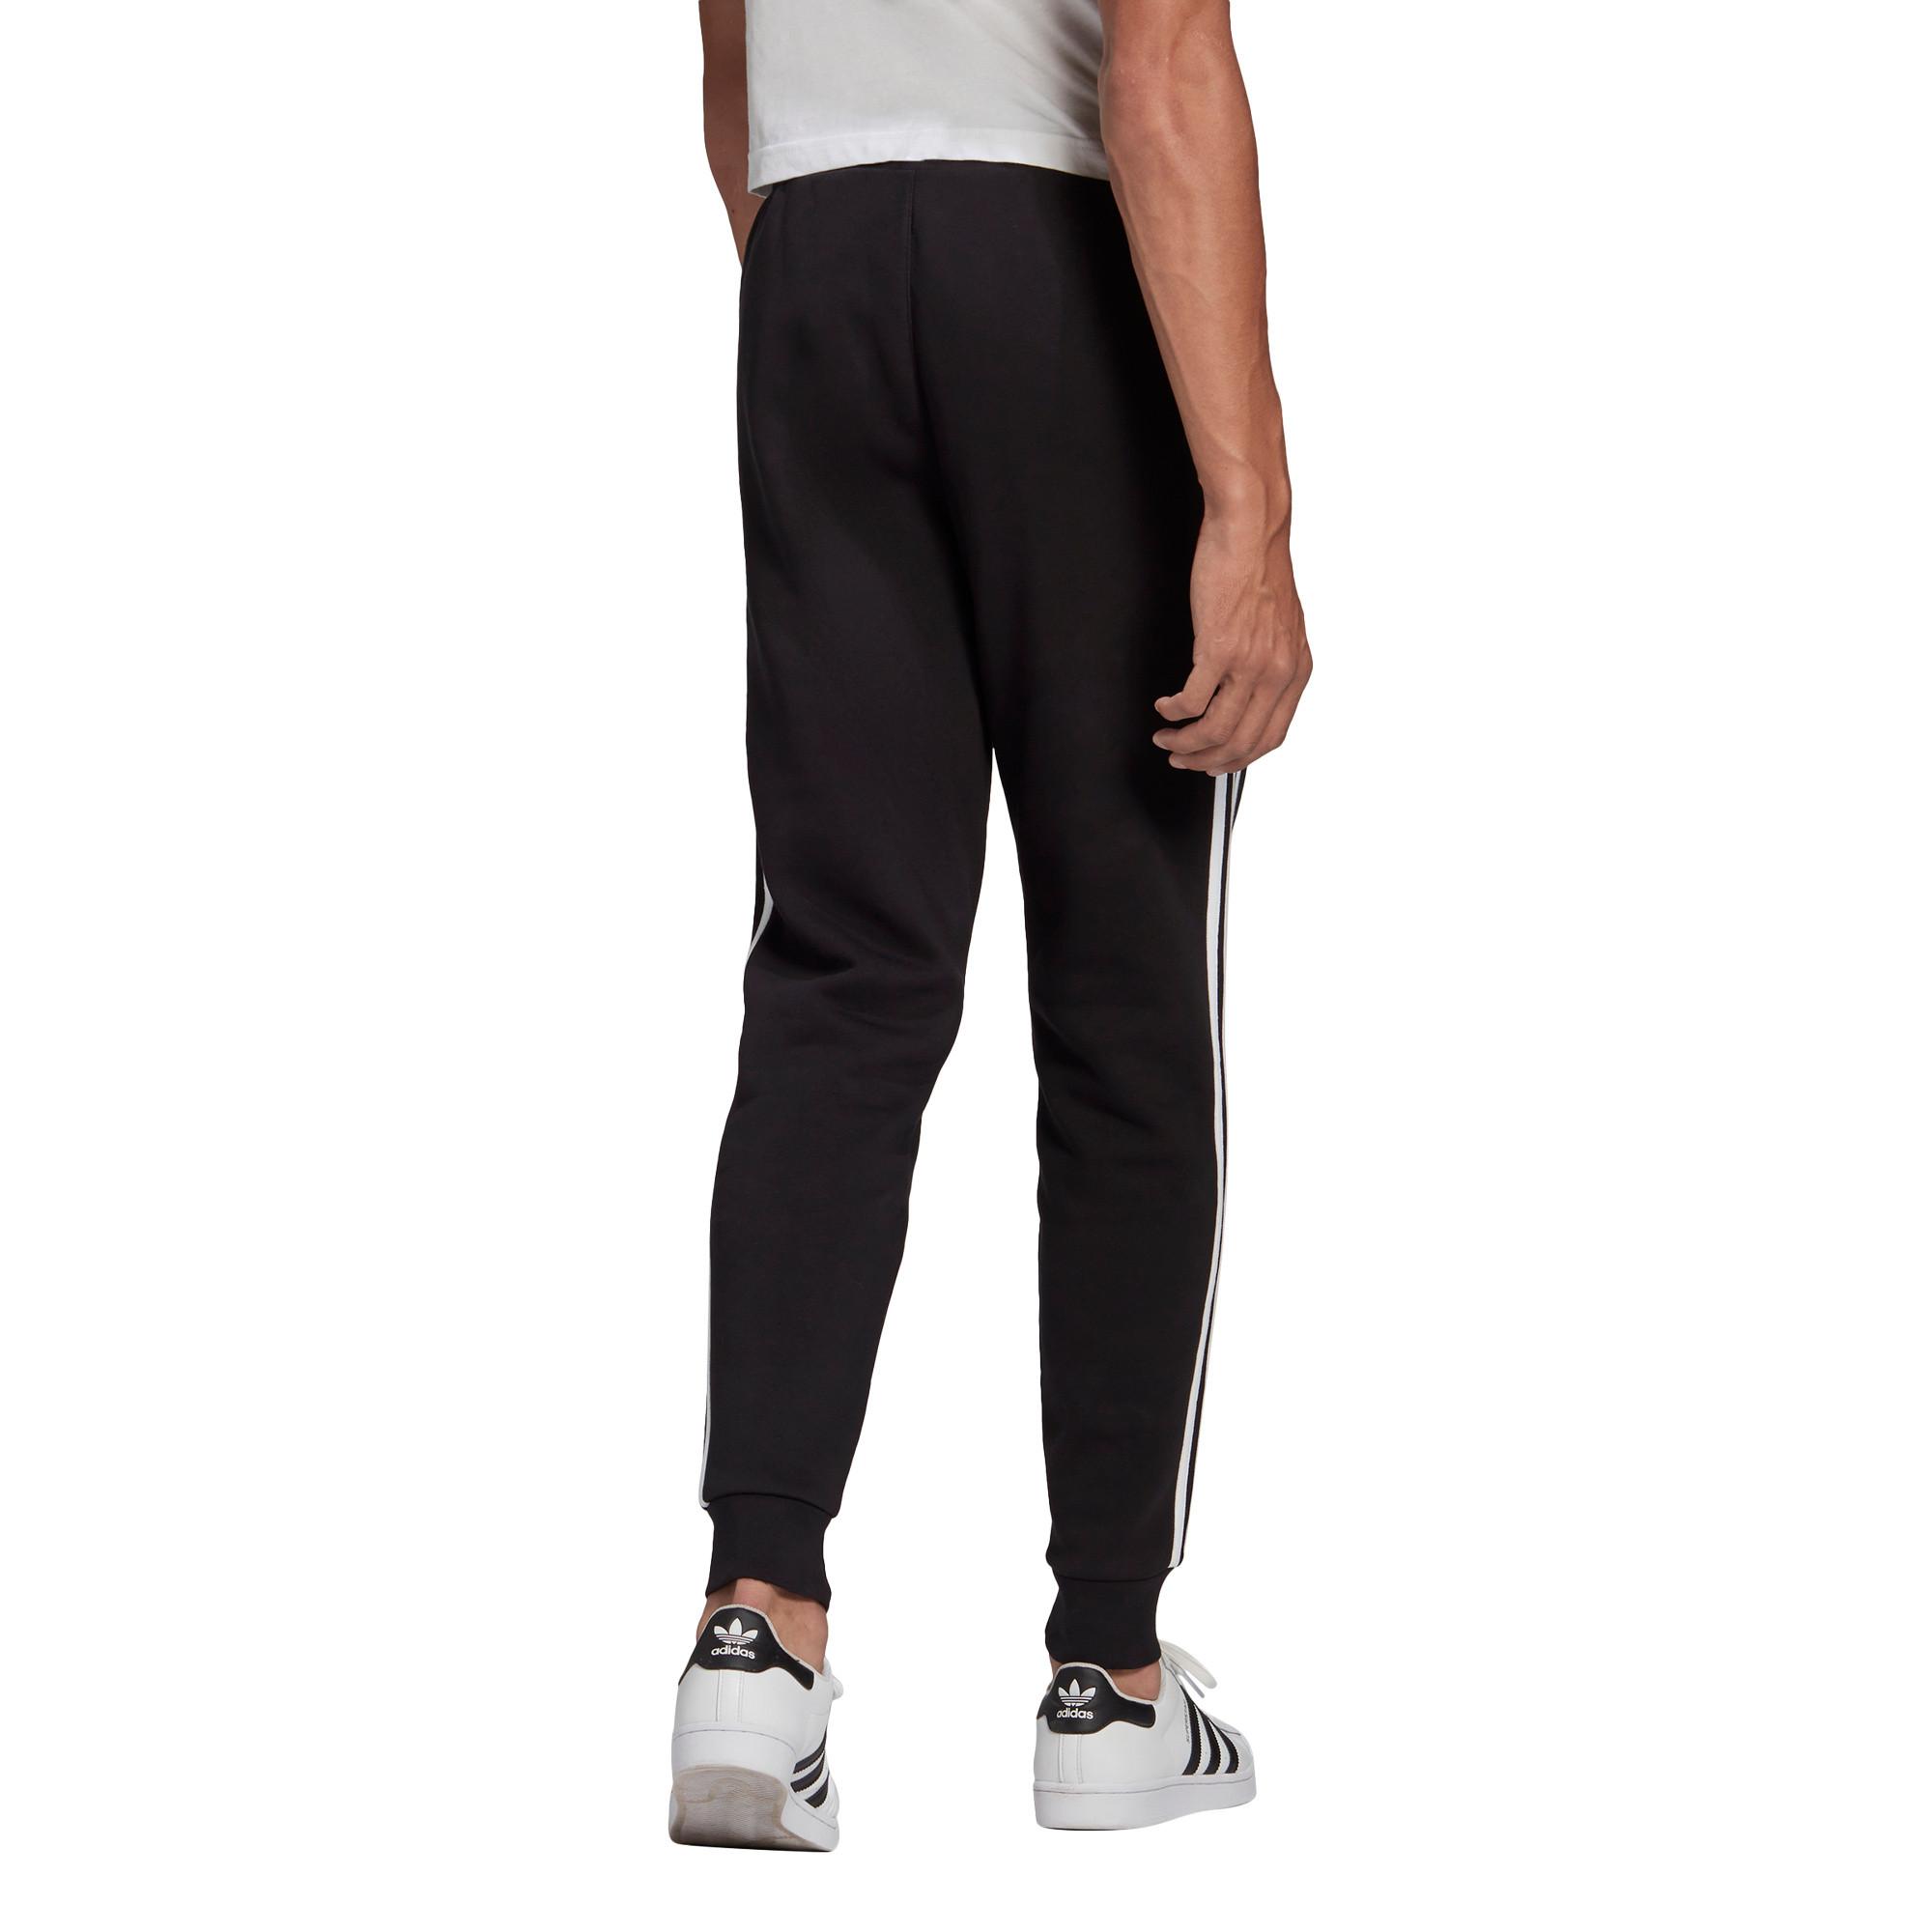 Pantaloni uomo adicolor Classics 3-Stripes, Nero, large image number 1